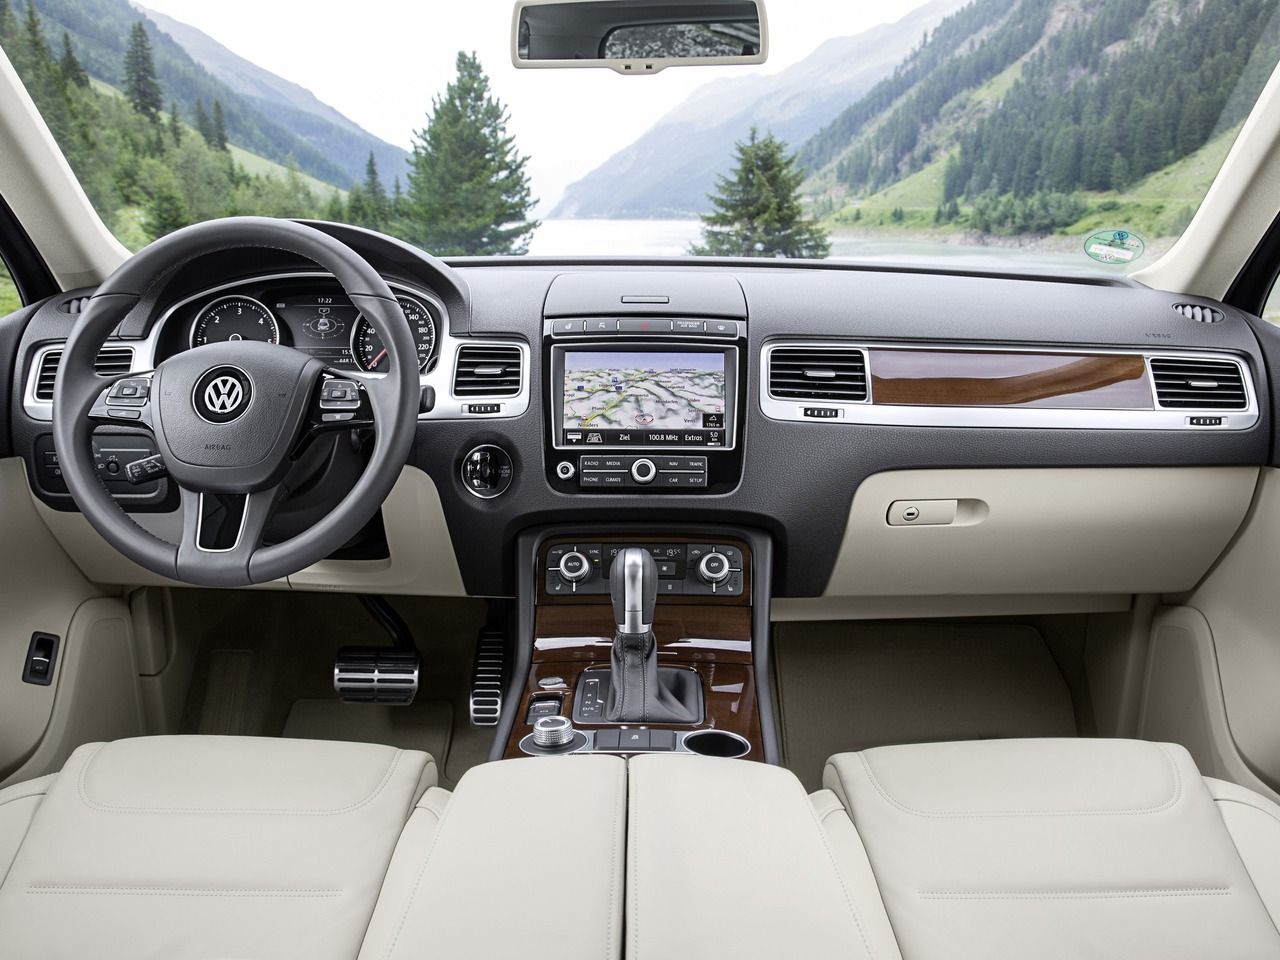 Снимки: Volkswagen Touareg II Facelift